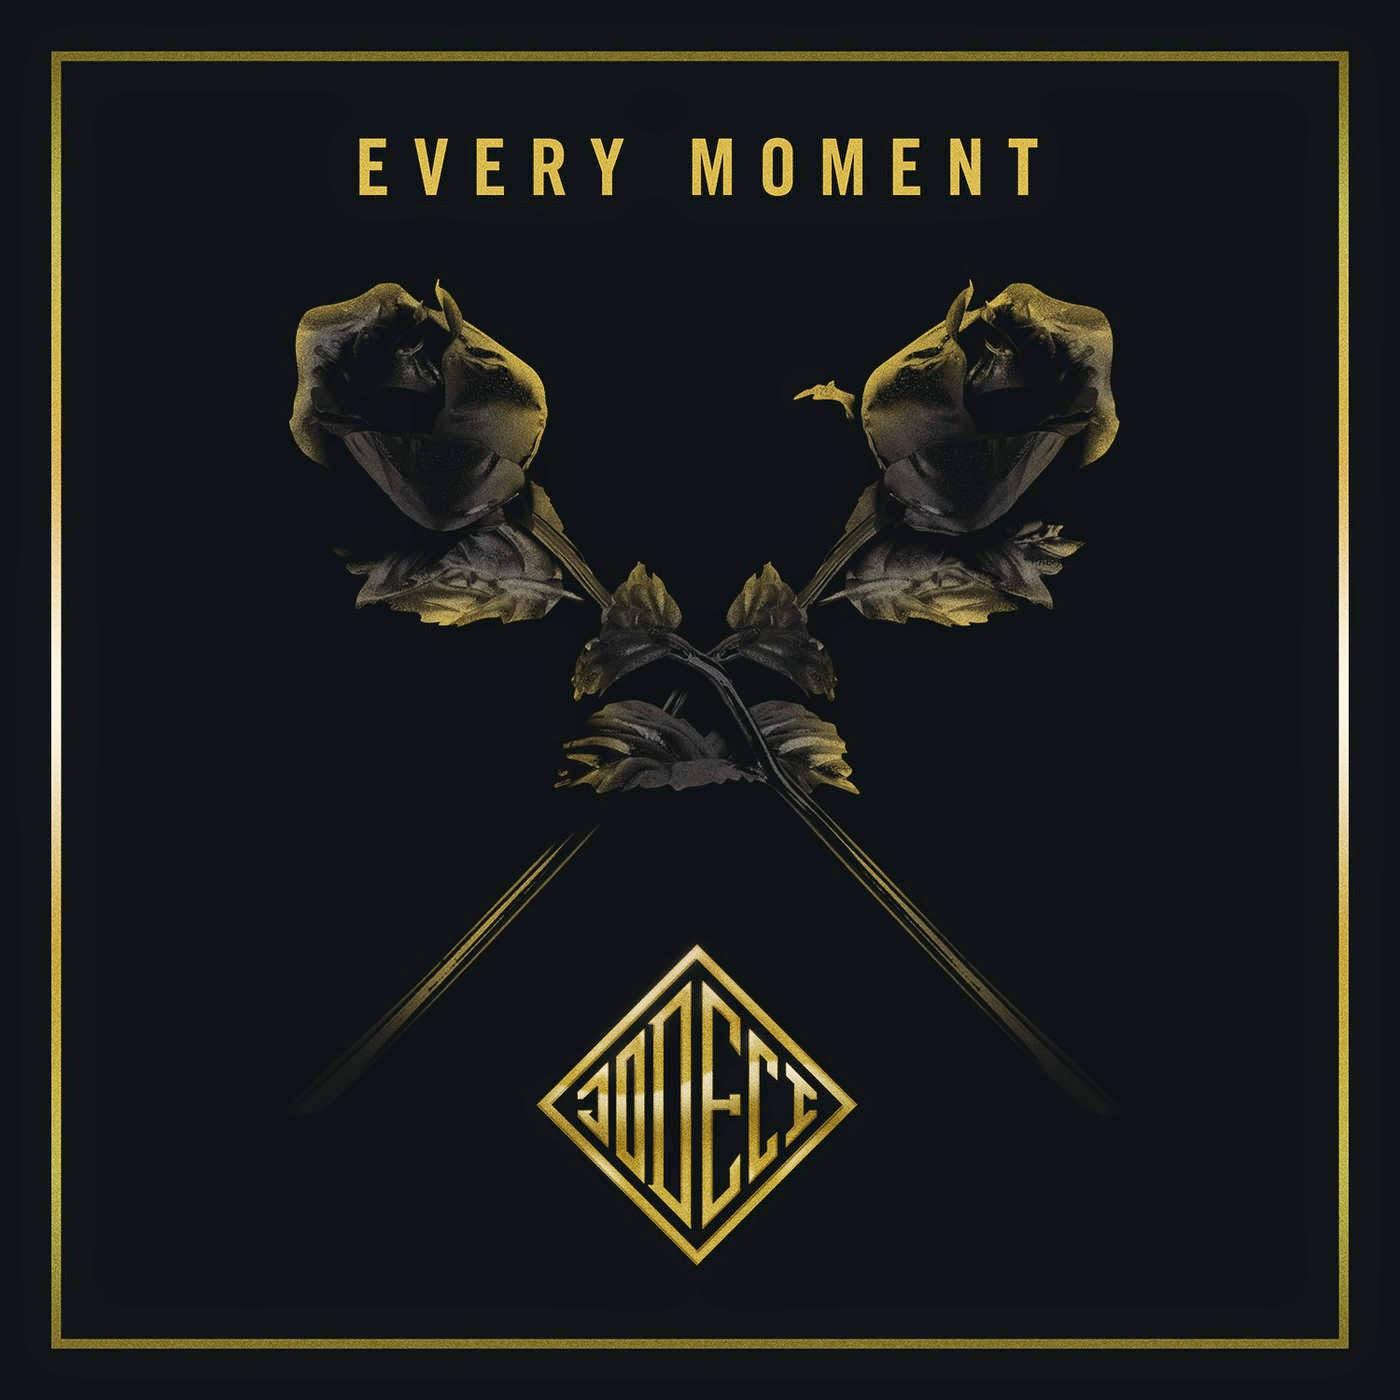 Jodeci - Every Moment - Single